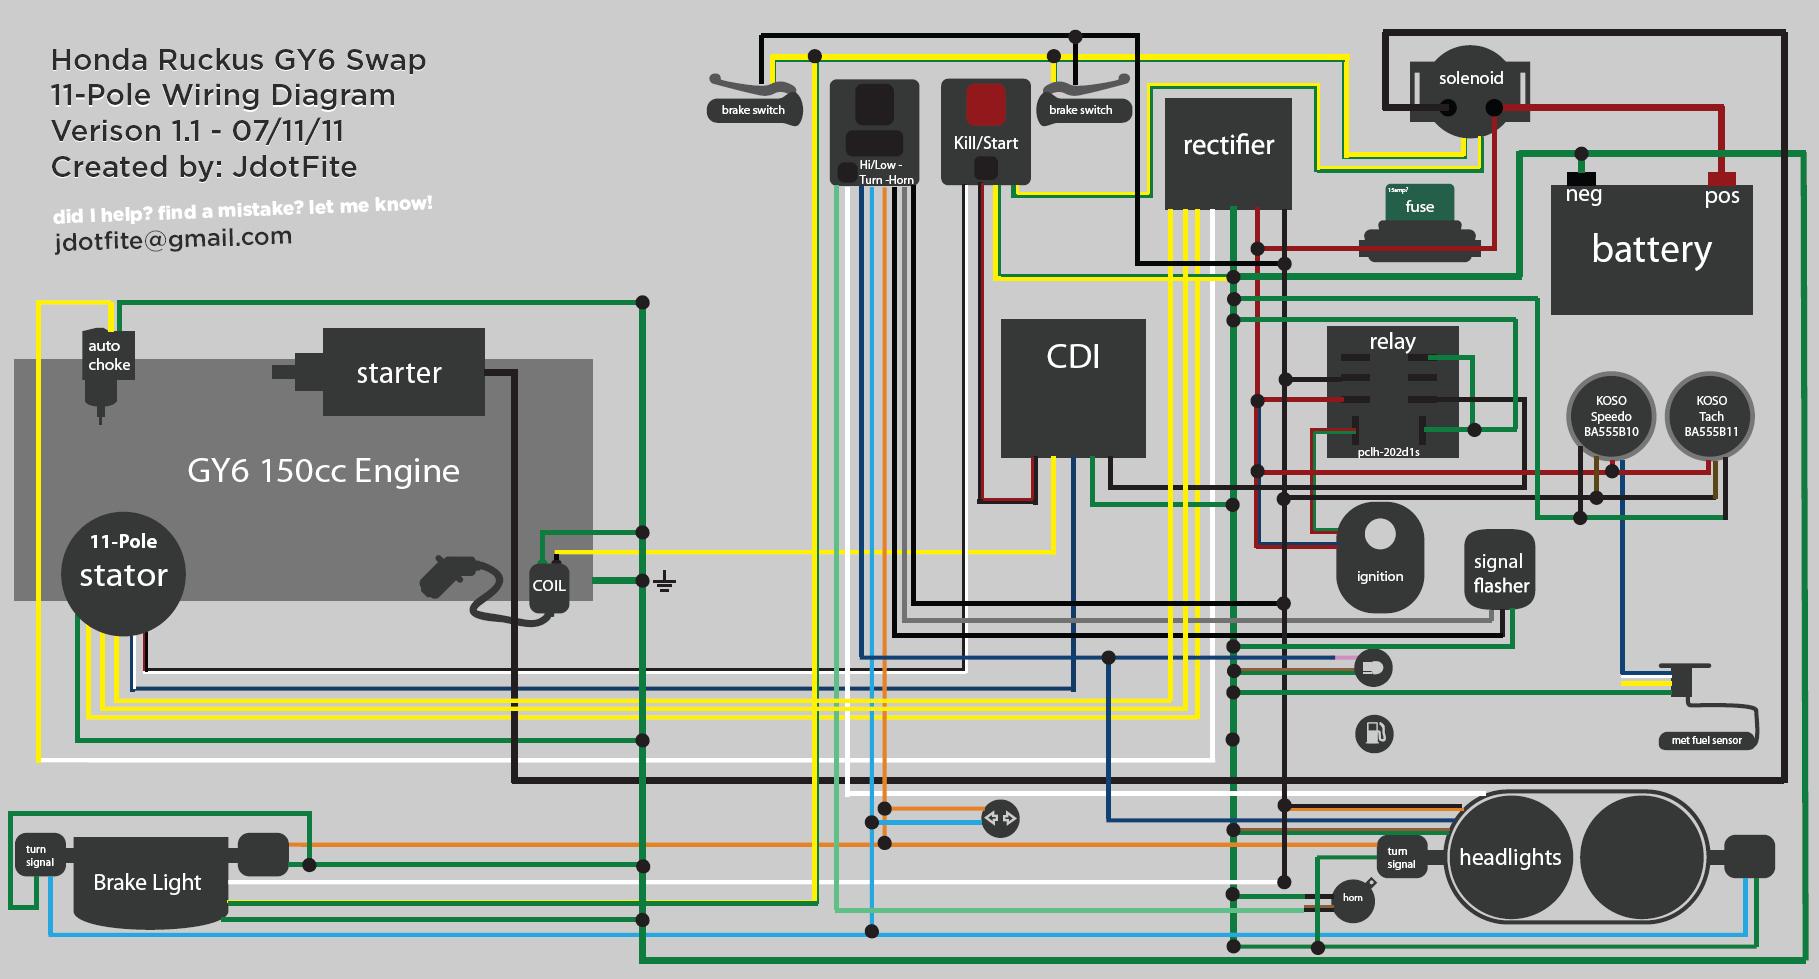 150 Gy6 Scooter Wiring Diagram | Manual E-Books - Honda Ruckus Wiring Diagram